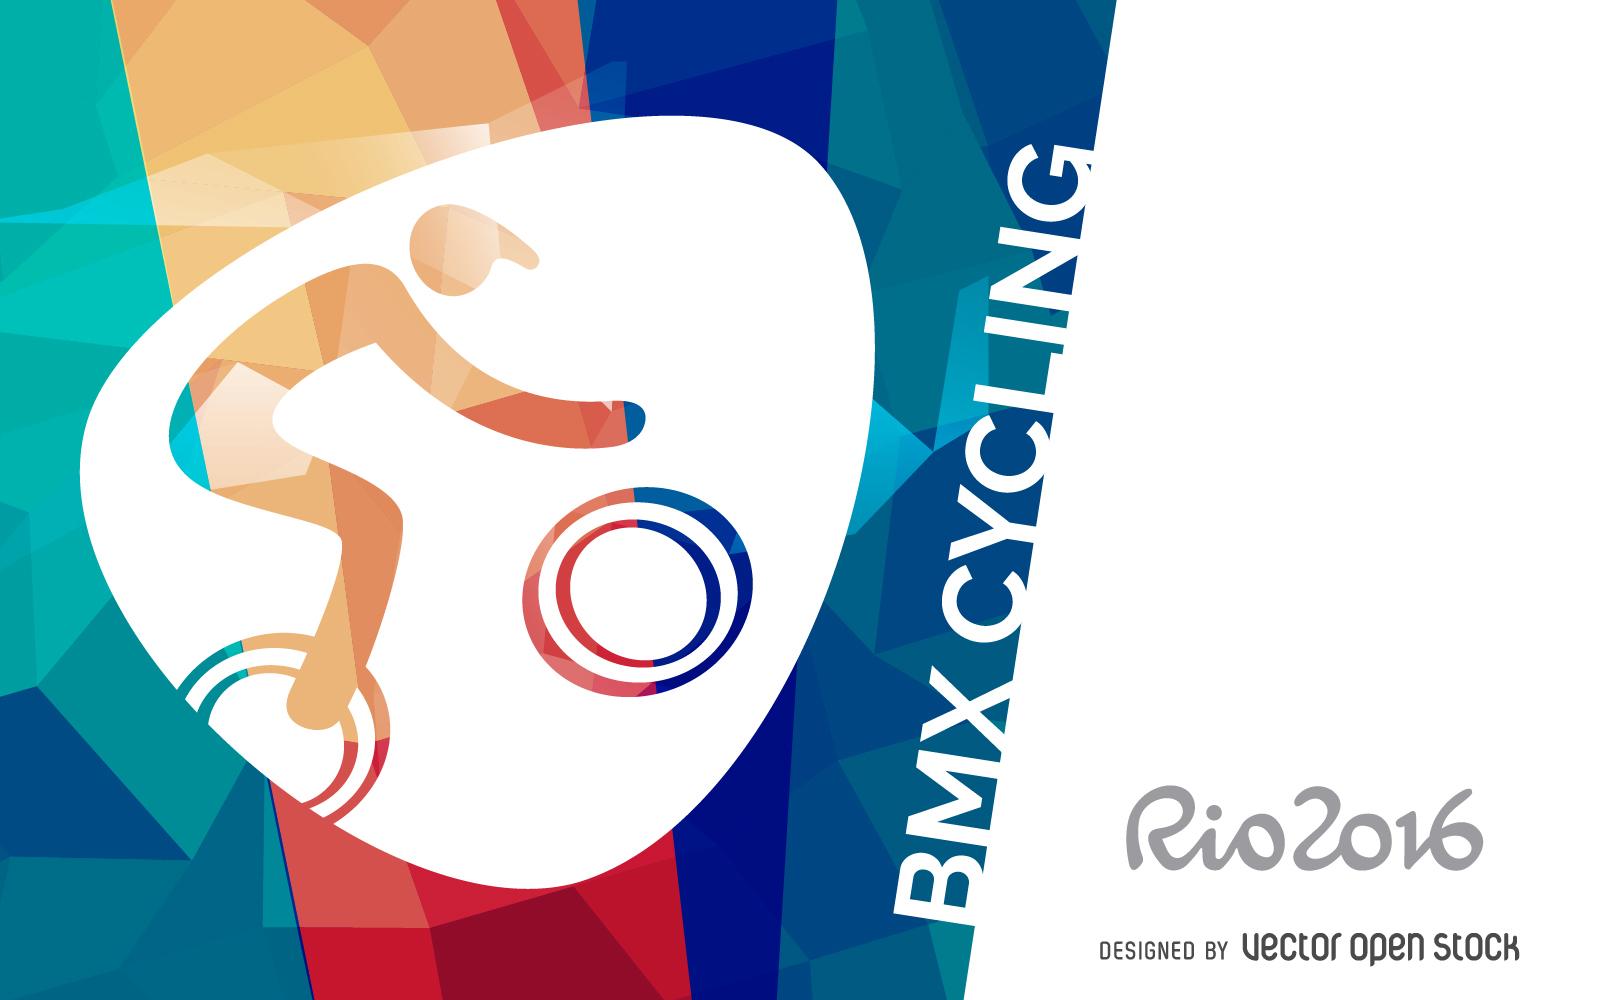 rio-2016-bmx-cycling-poster